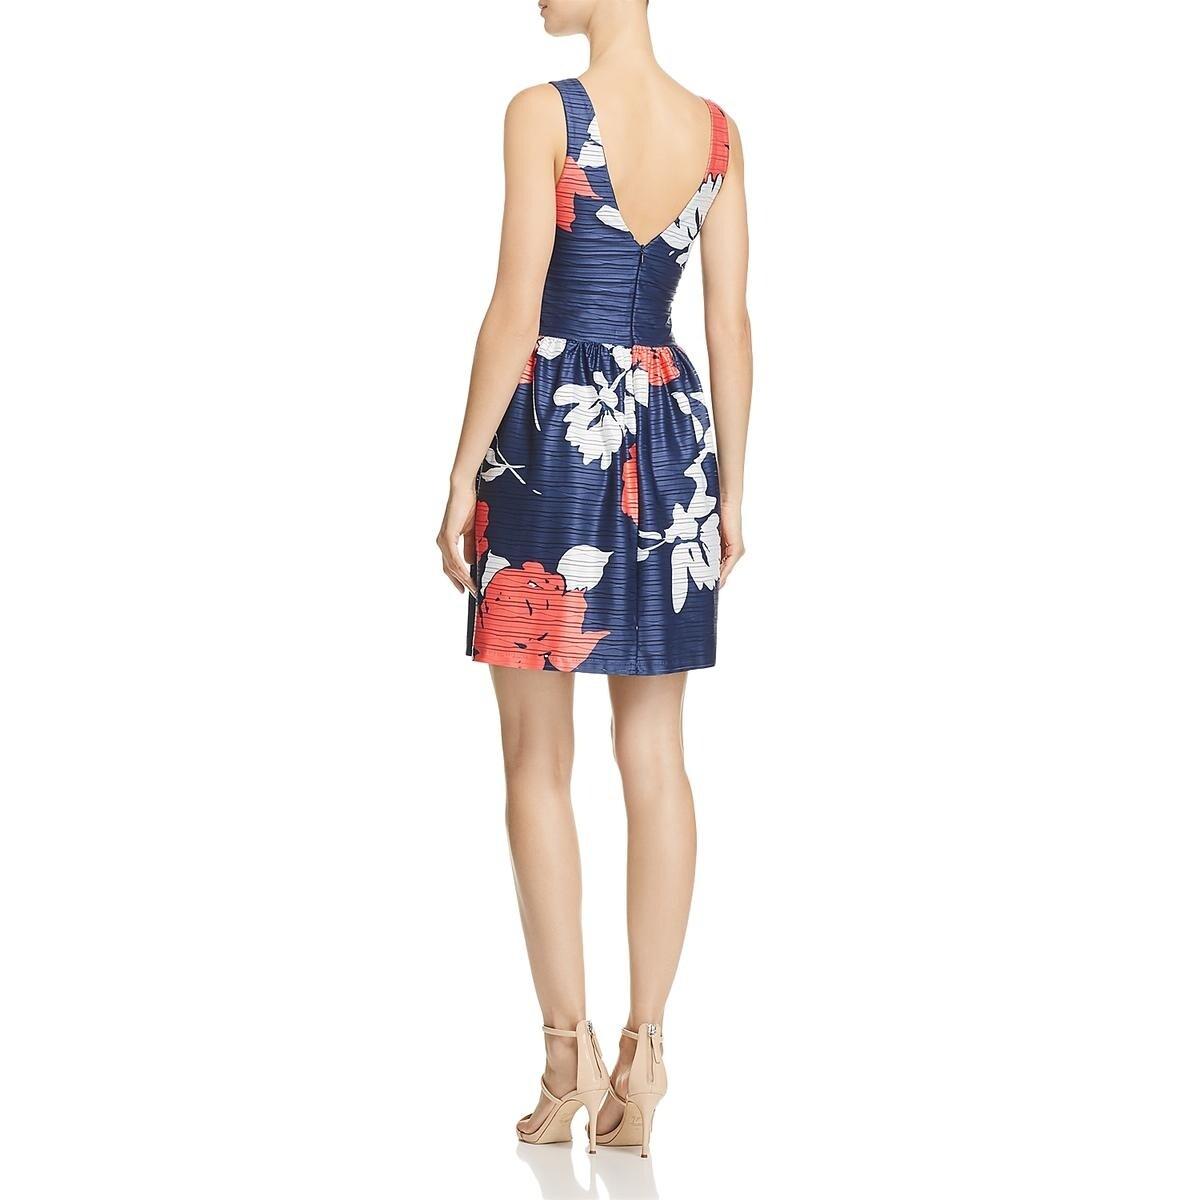 Aqua Womens Floral Fit /& Flare V Neck Casual Dress BHFO 5636